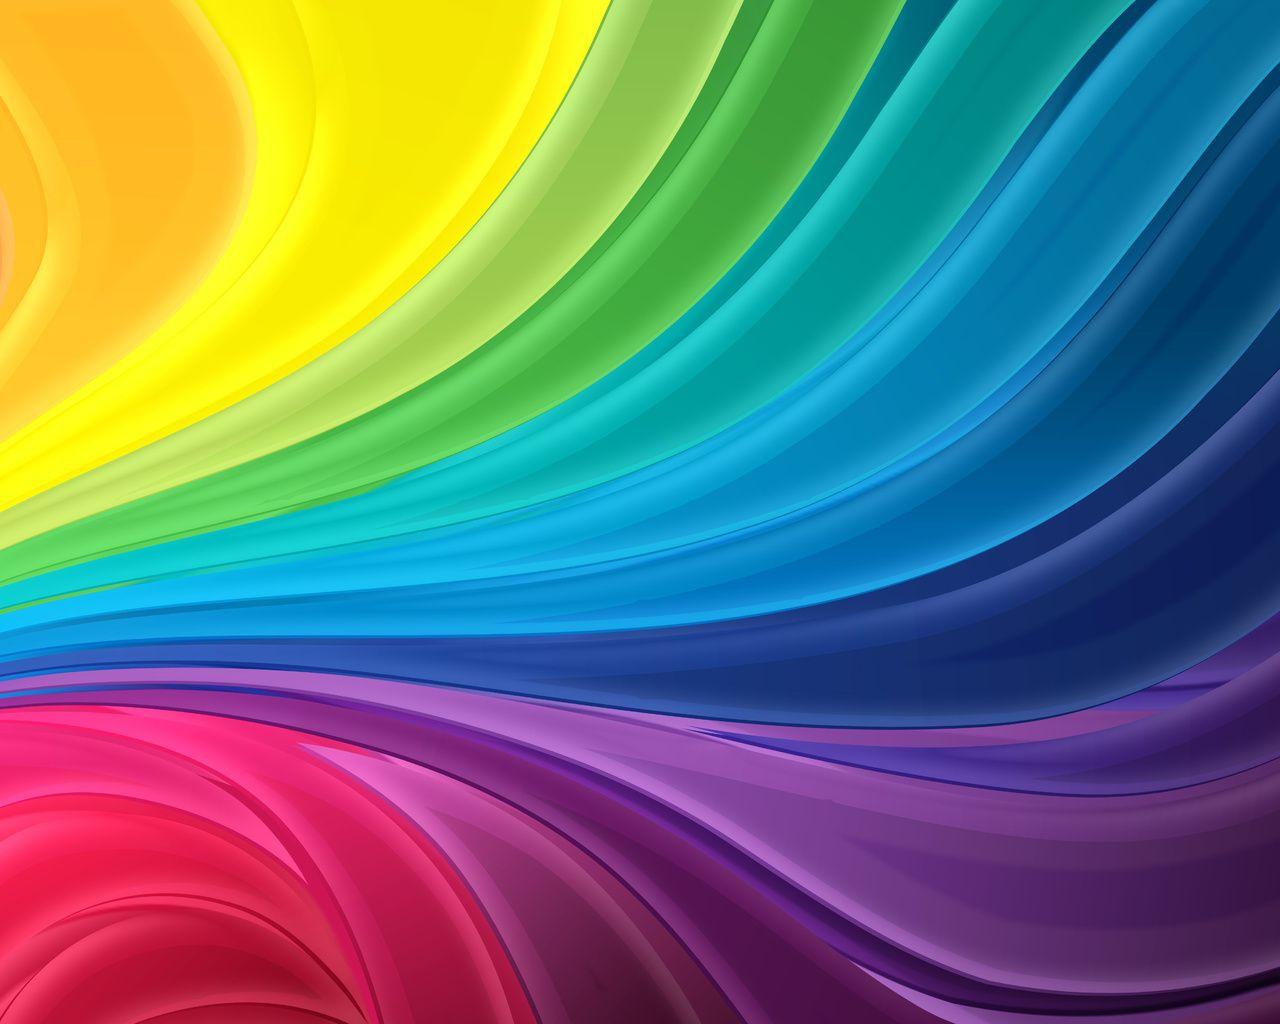 rainbow of colors - wallpaper on your desktop :: BigFon.com